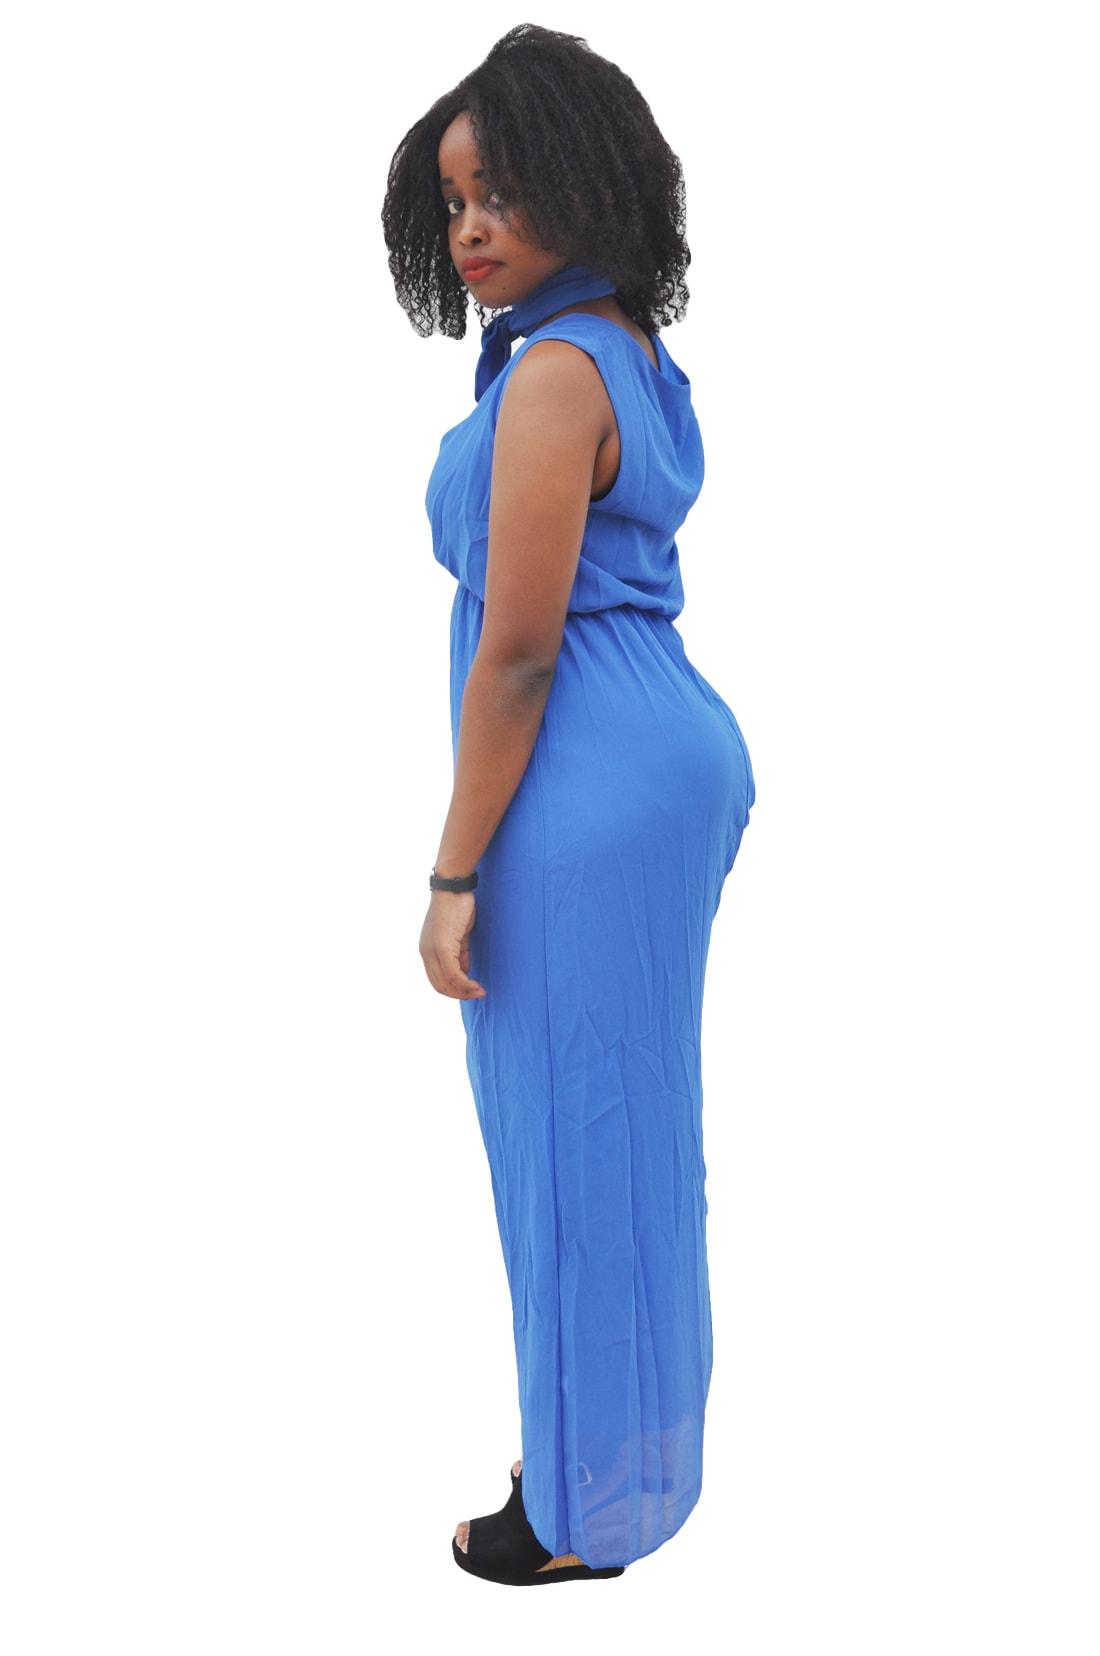 M0297 blue2 Bohemian Dresses maureens.com boutique